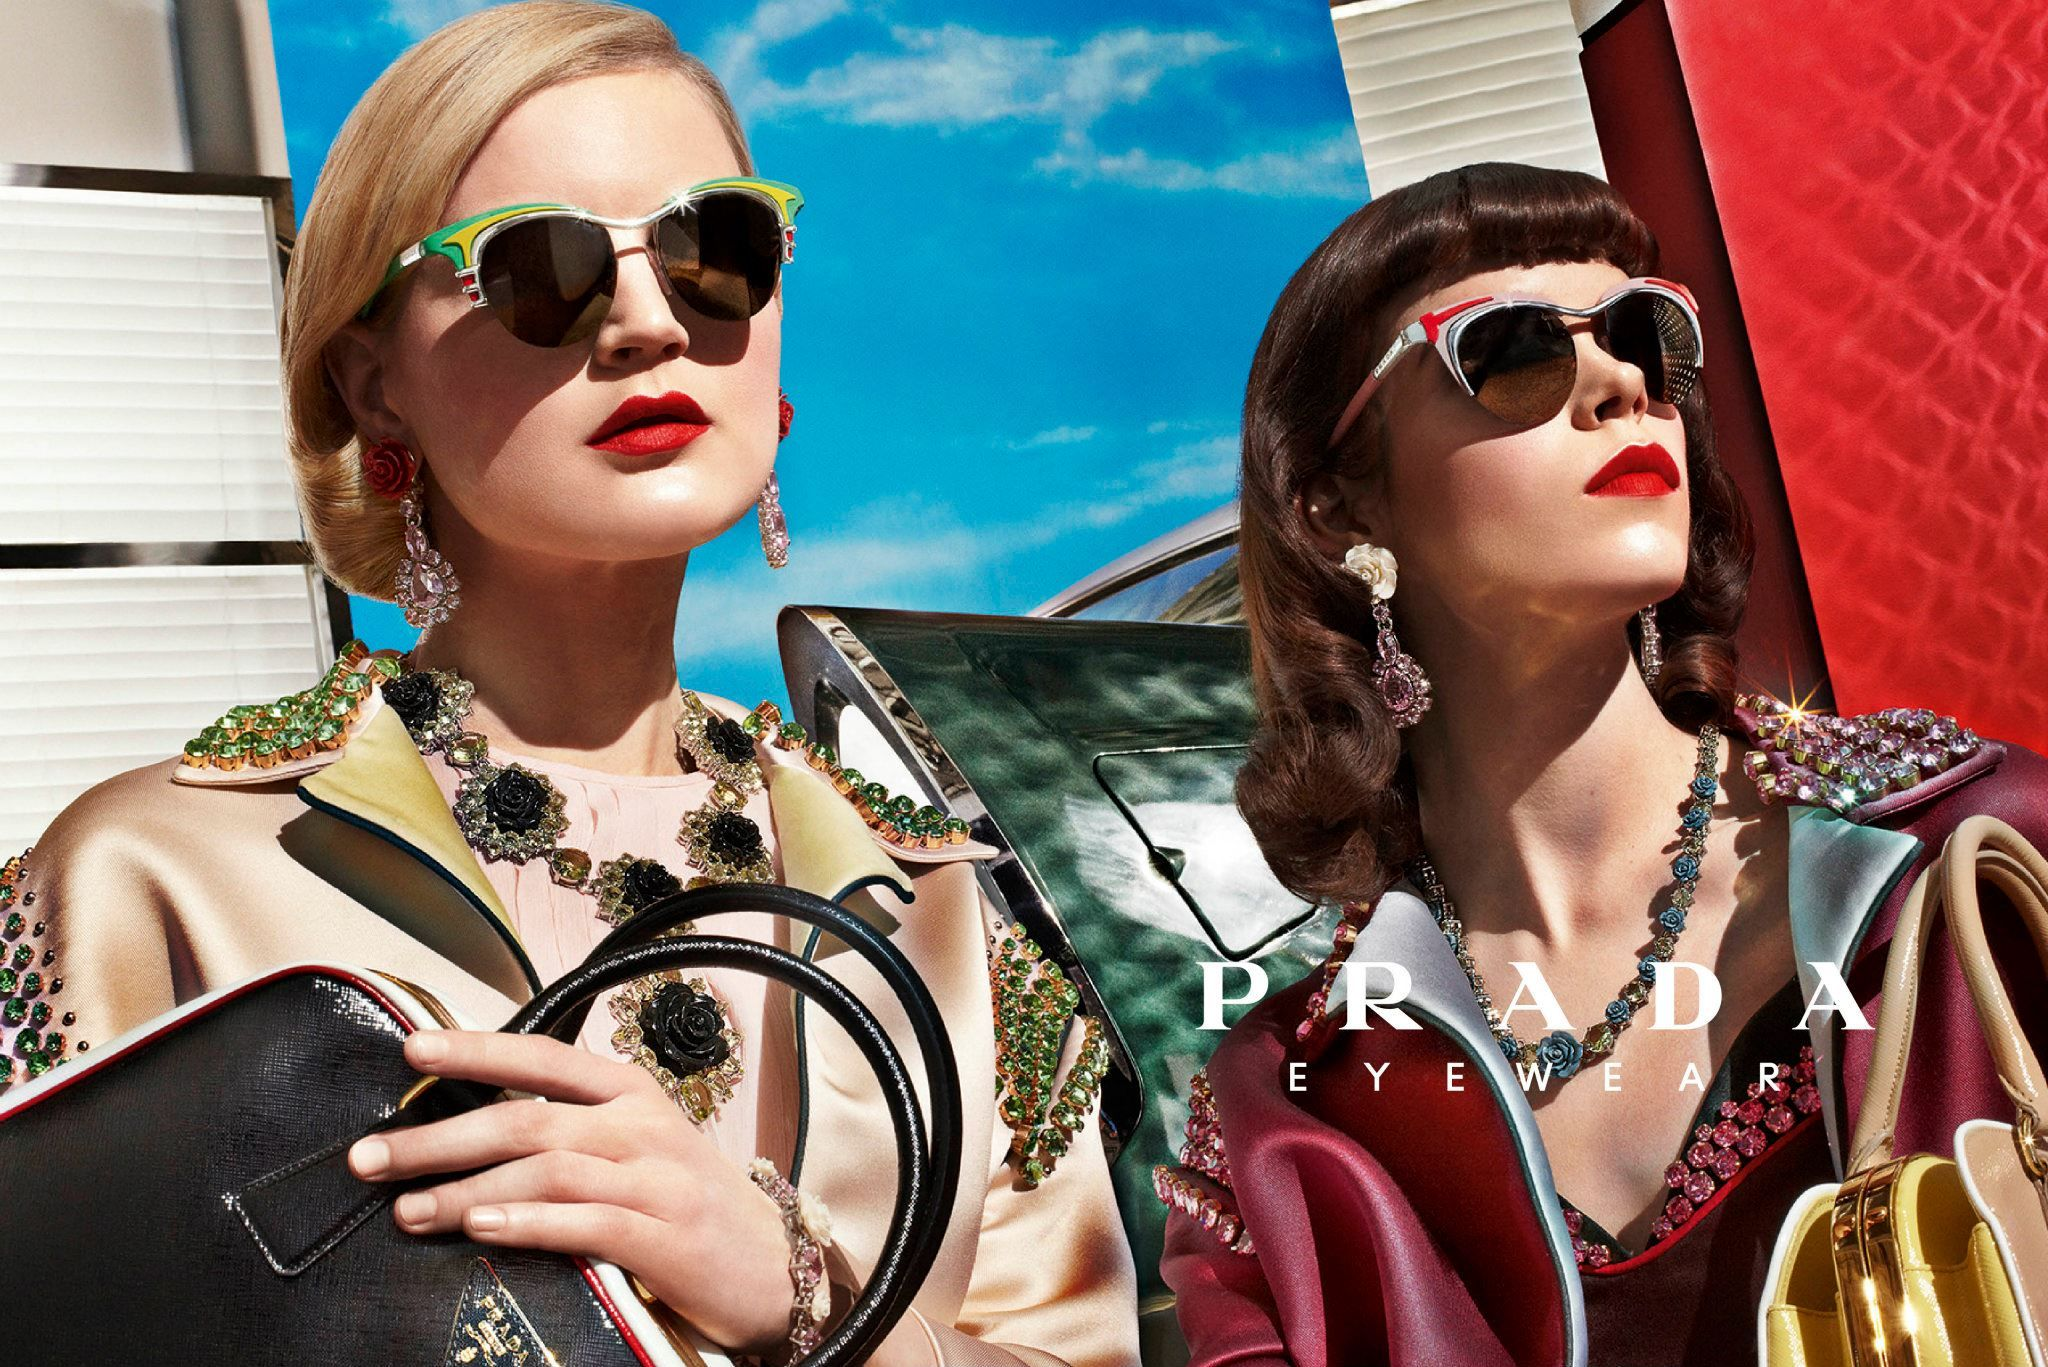 a4cda6282766 Prada Spring Summer 2012 Ad Campaign